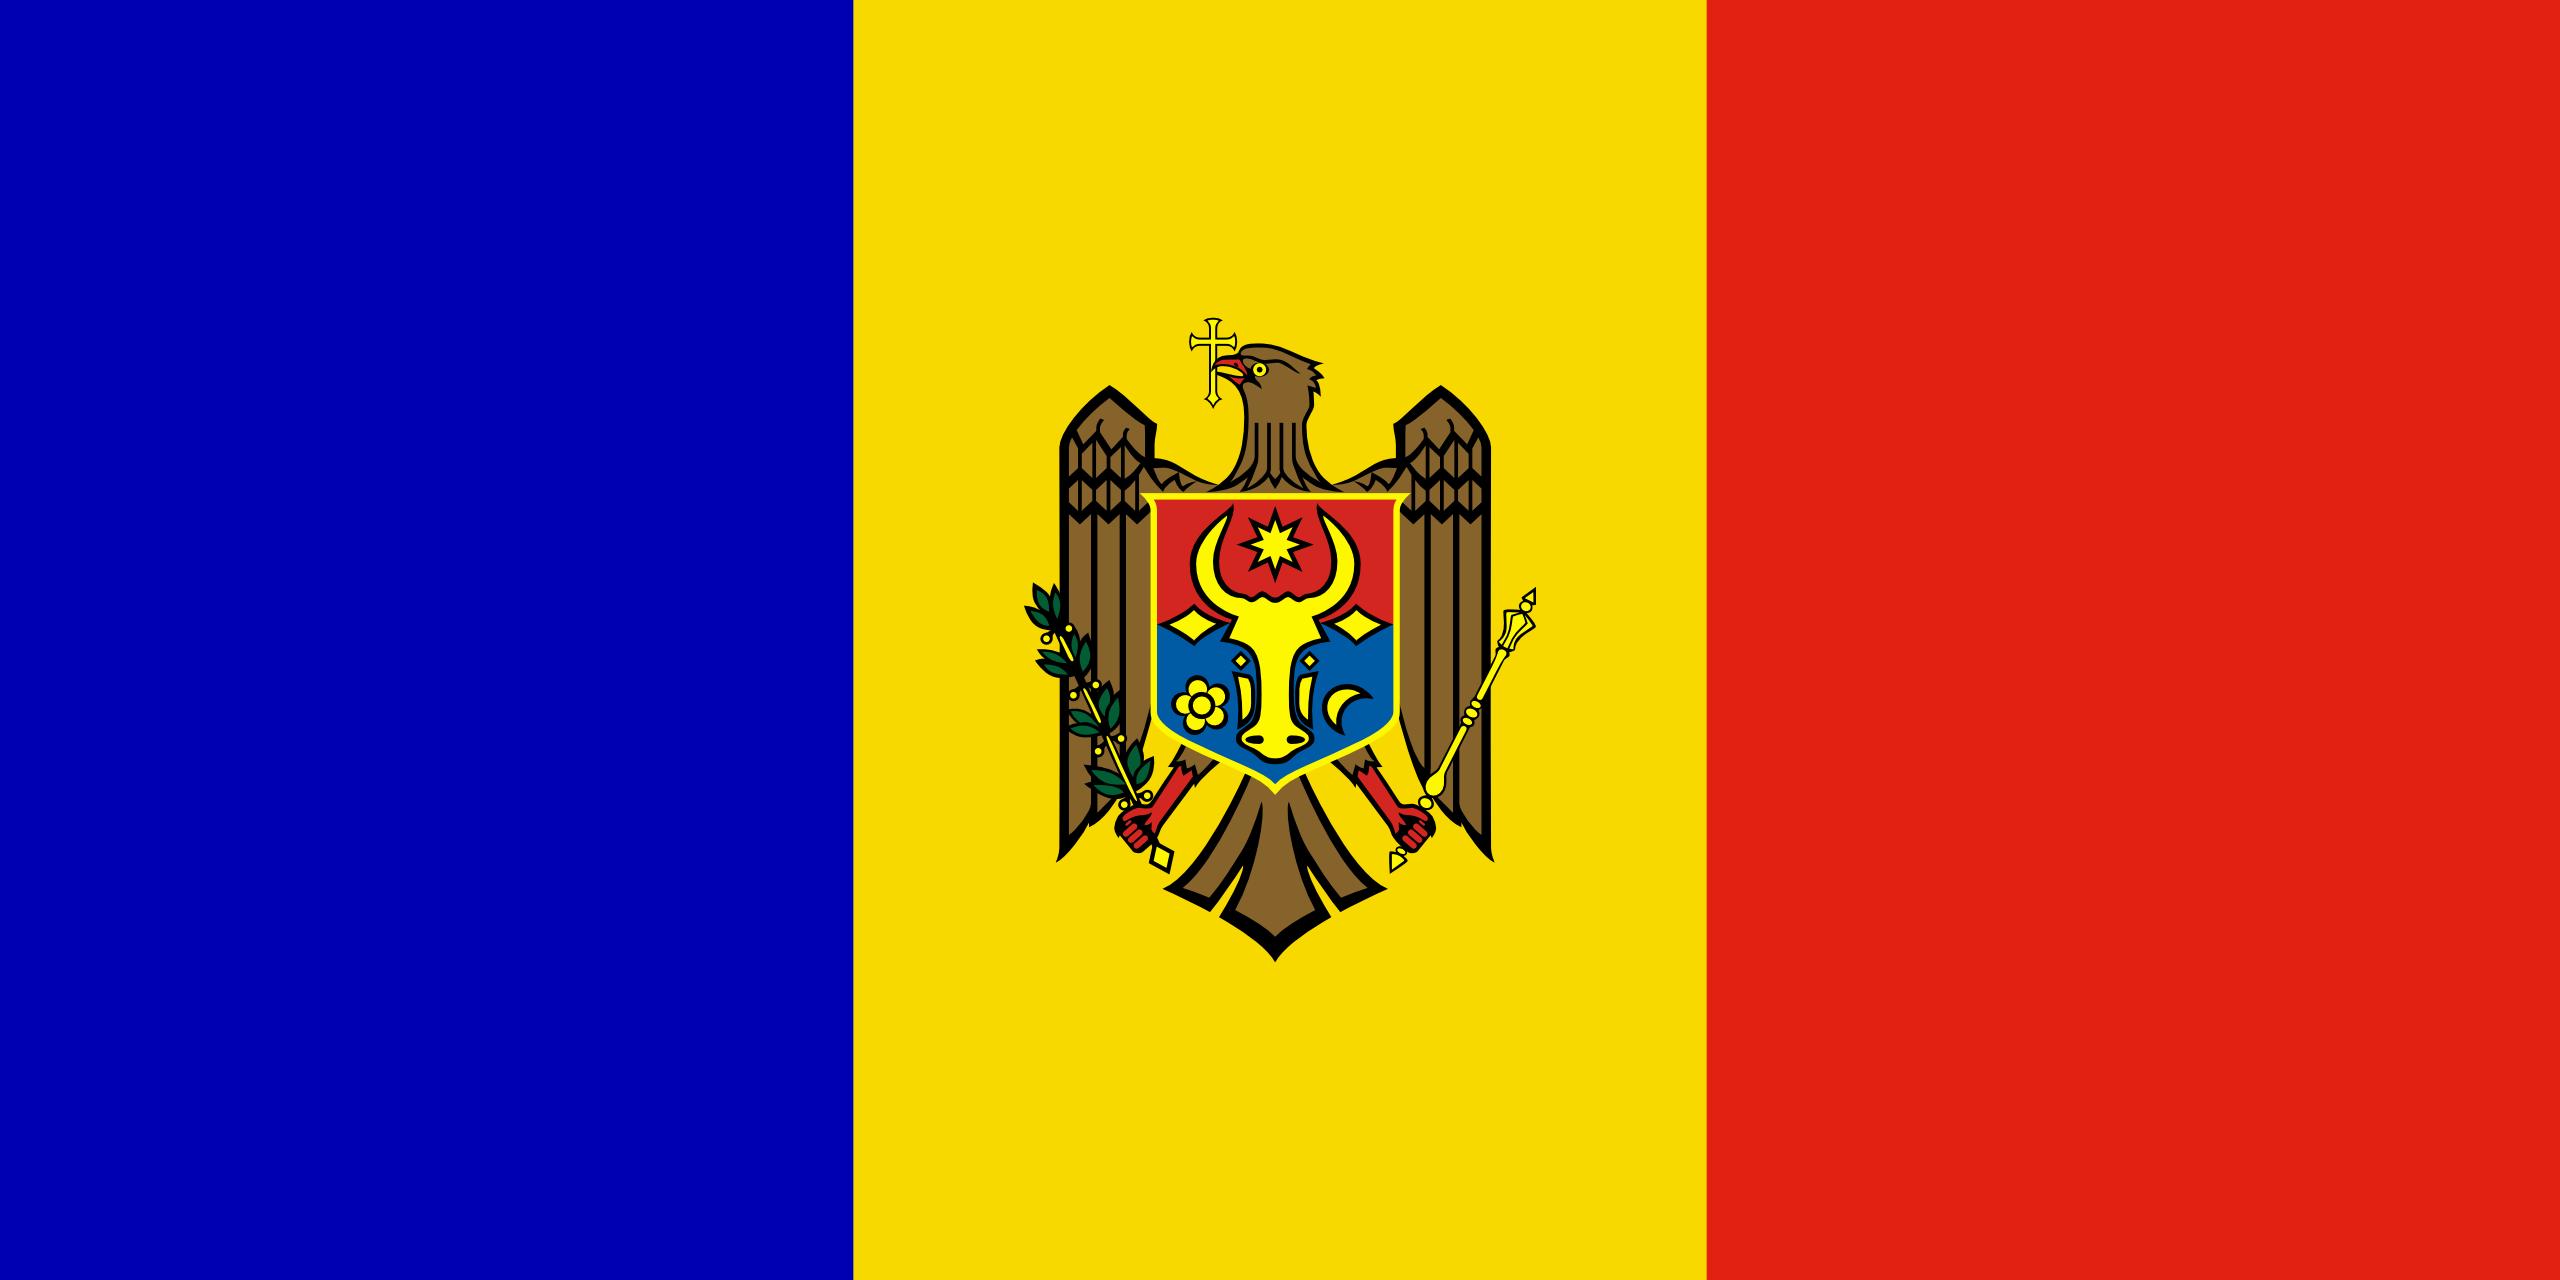 Молдова, страна, Эмблема, логотип, символ - Обои HD - Профессор falken.com